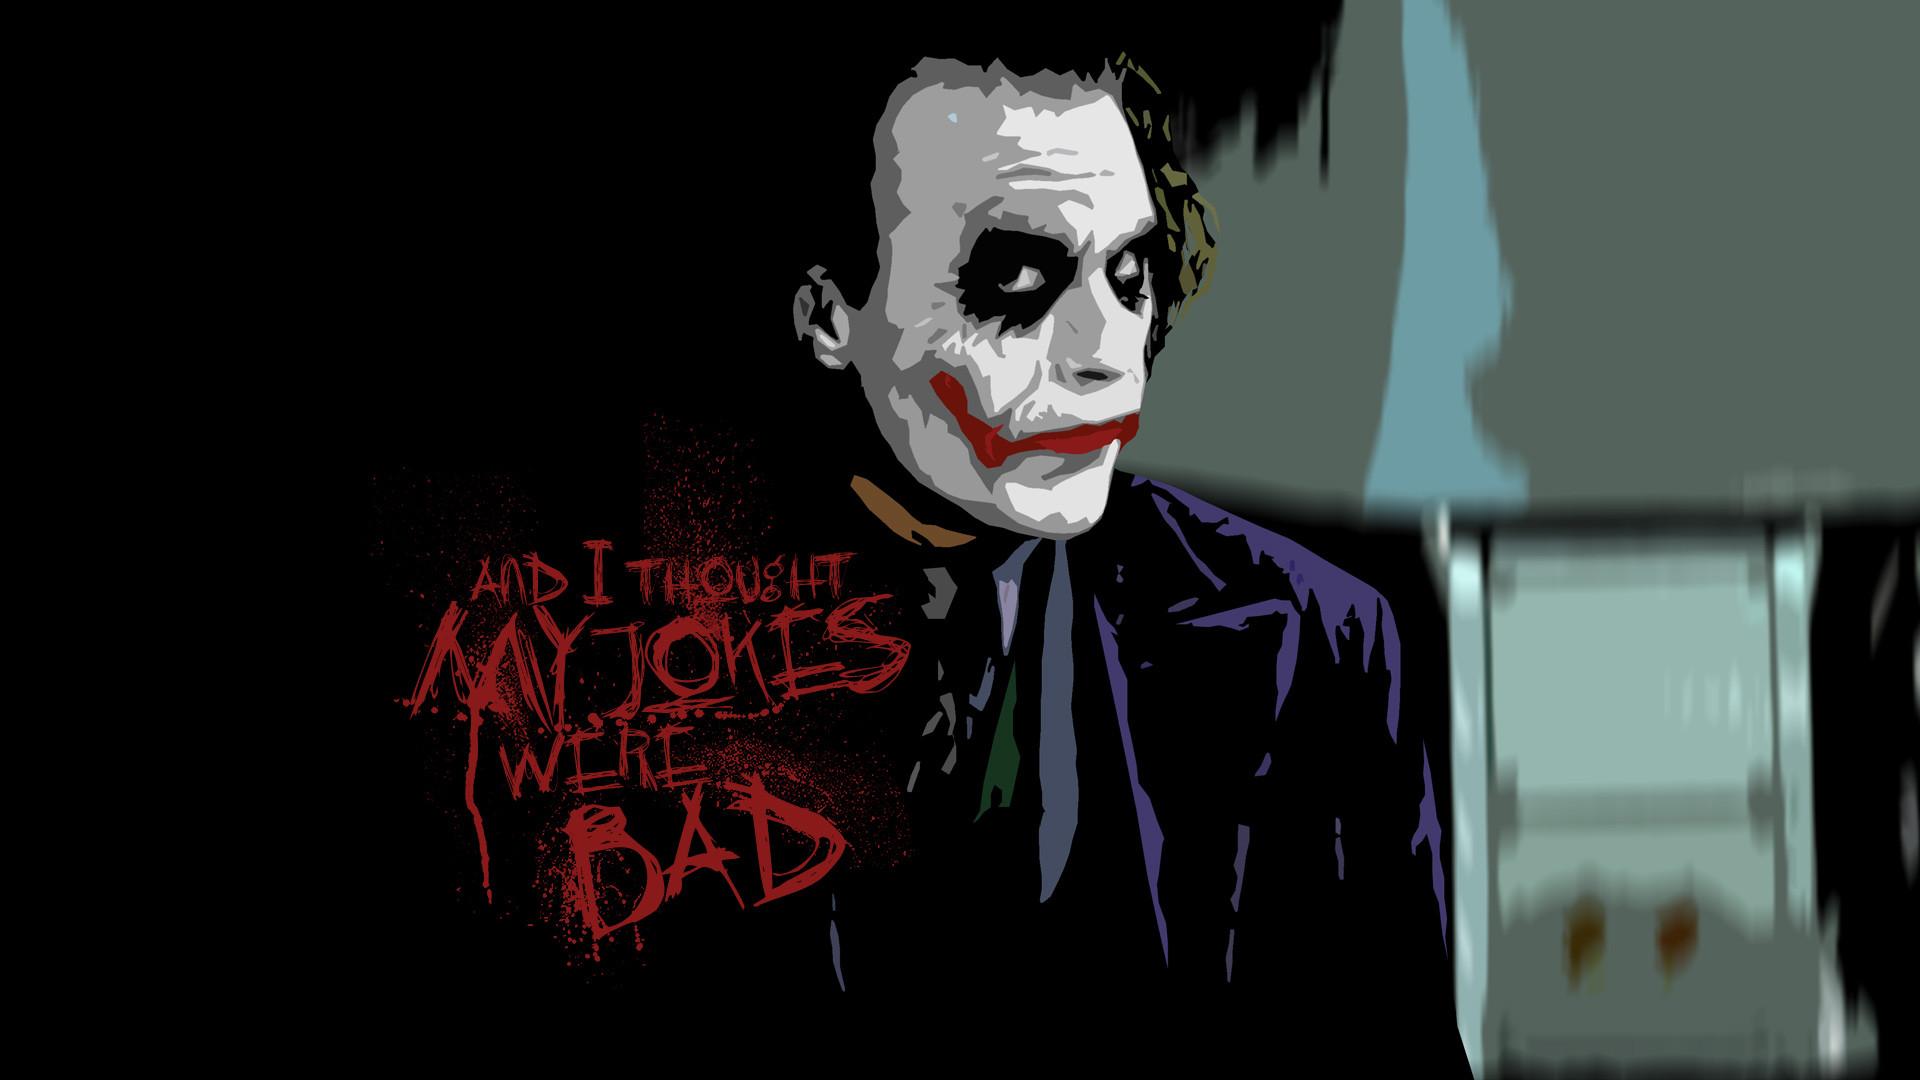 Coleccion The Joker (El guason – Heath Ledger)